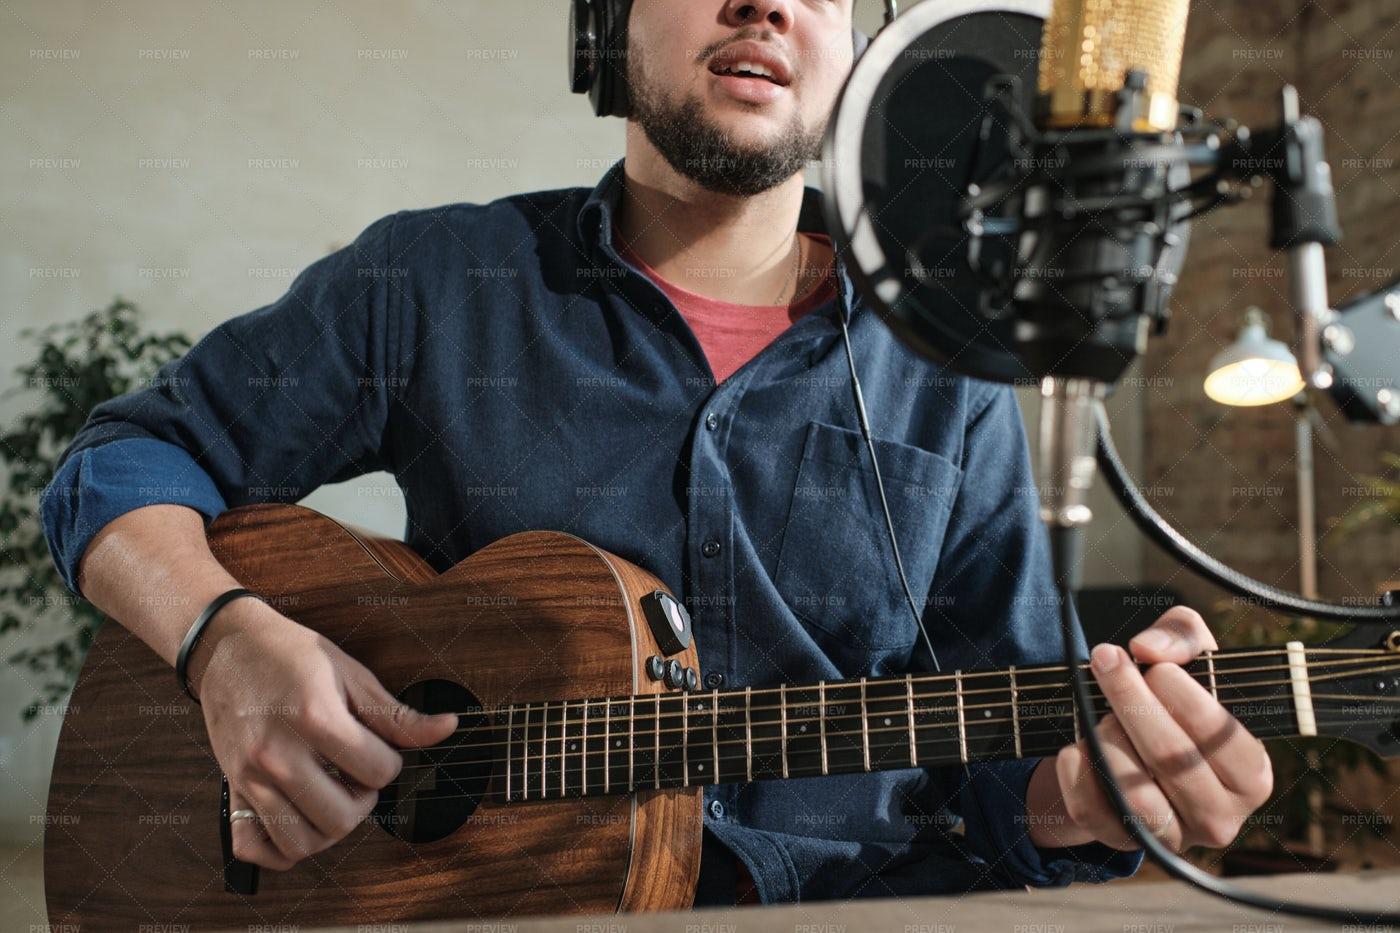 Man Playing Guitar In Studio: Stock Photos